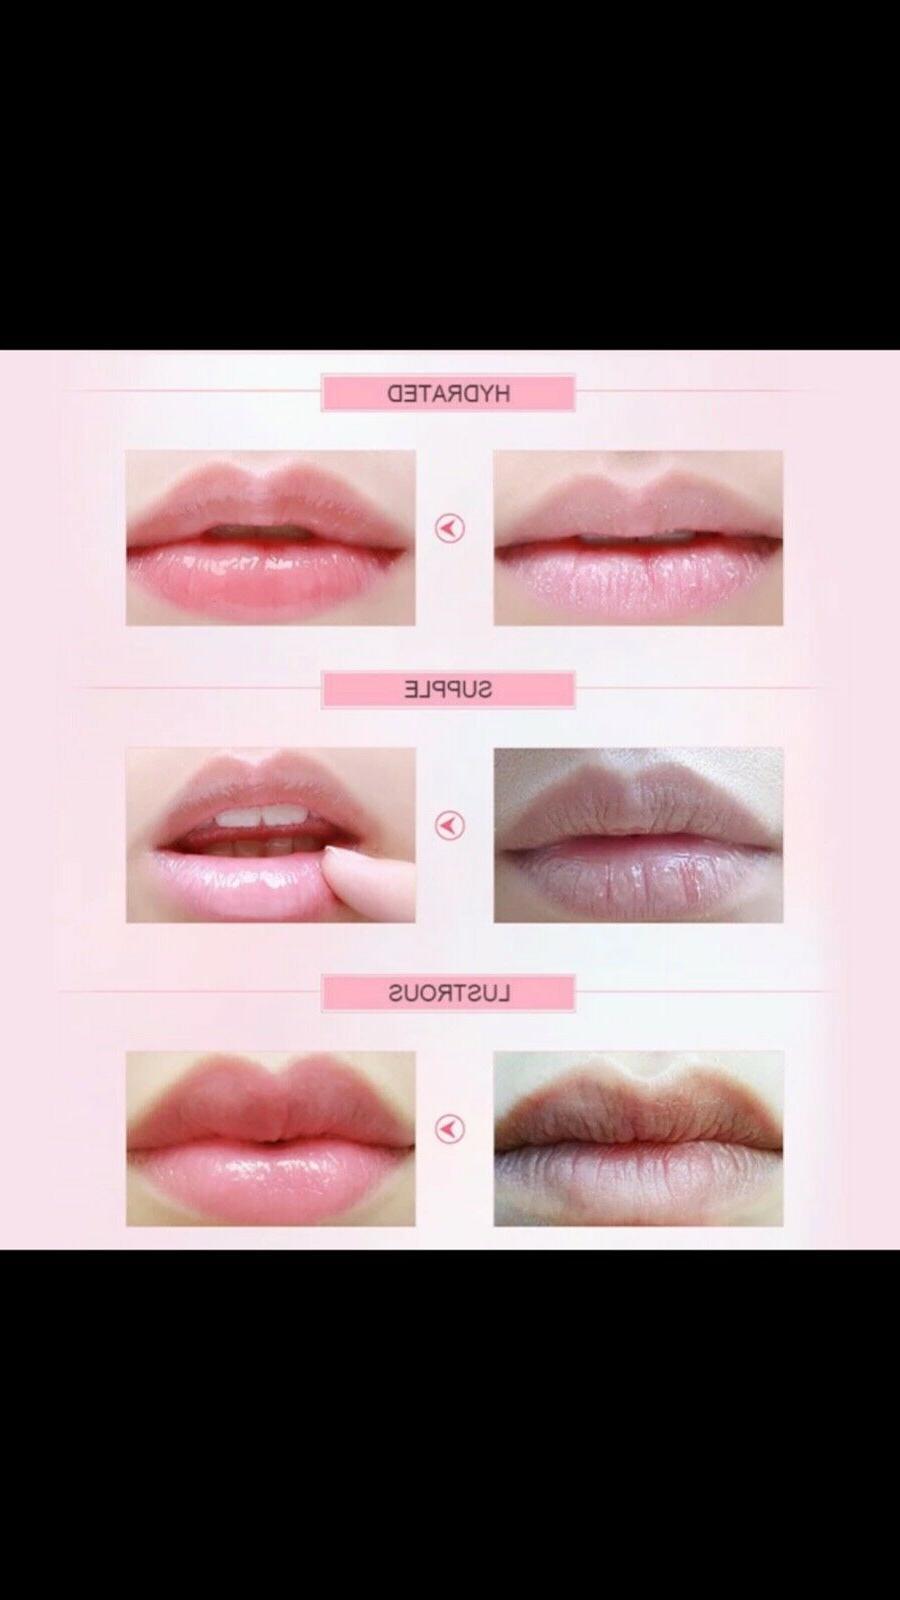 10pc 10pc Collagen Lip Combination